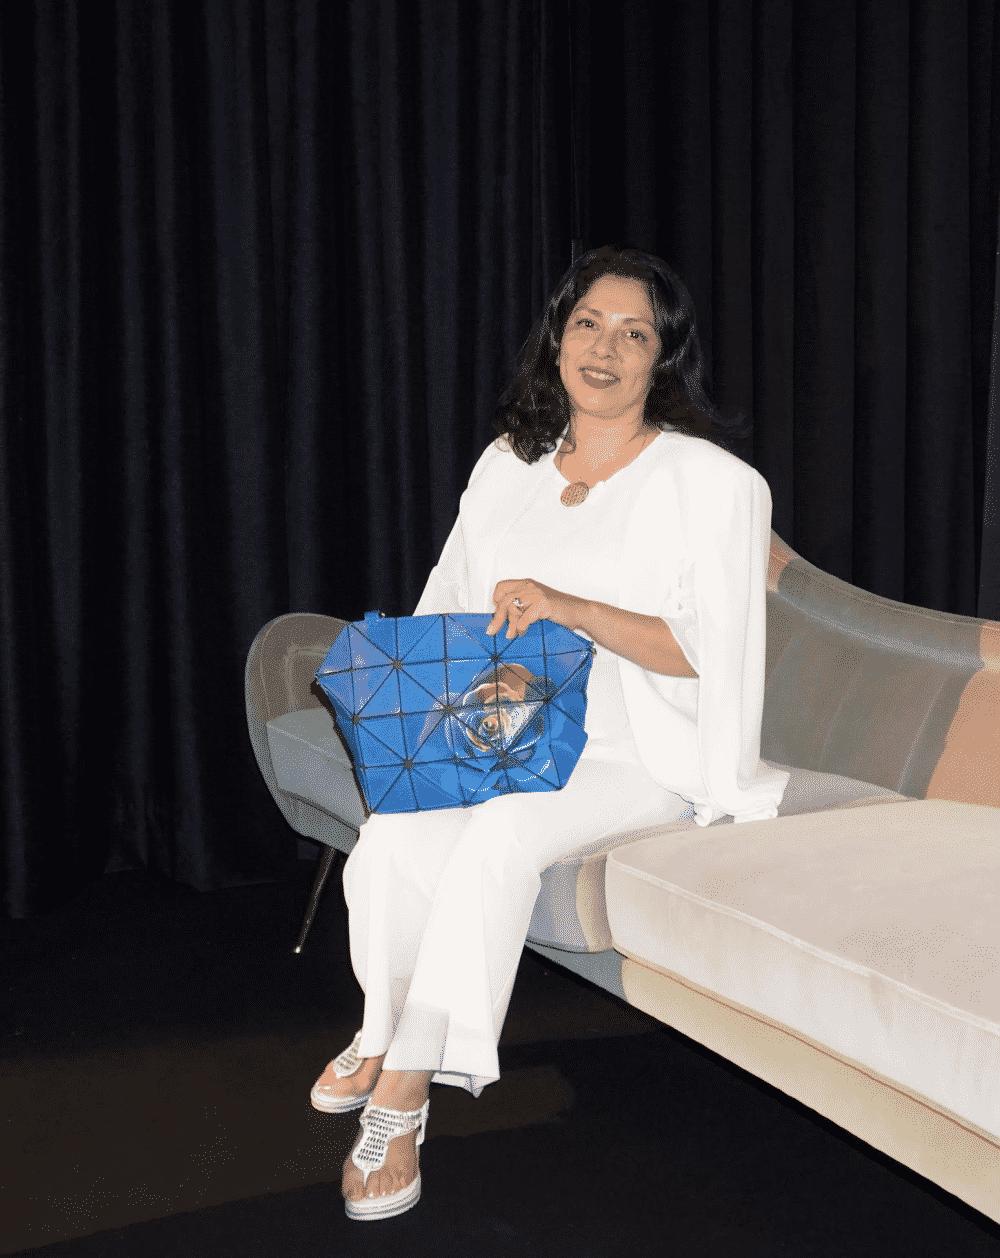 Karla Chacon International Architect Interior Designer